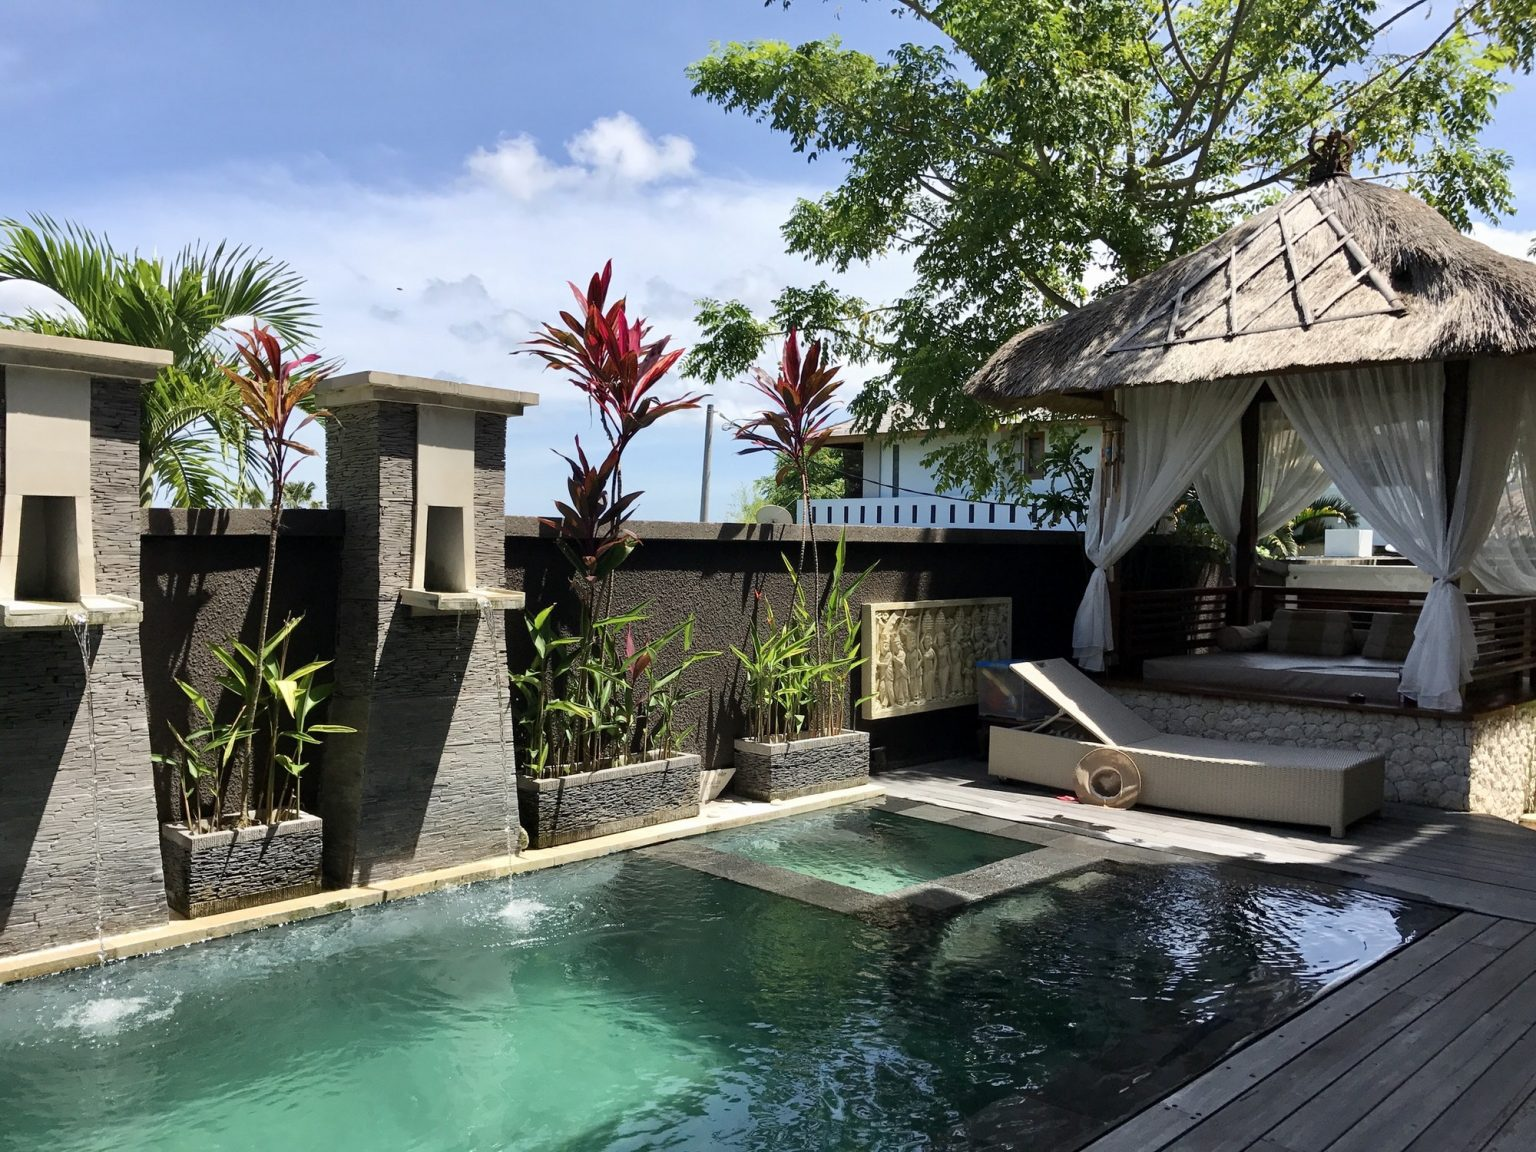 Luxury private pool villa. Indonesia, Bali island.